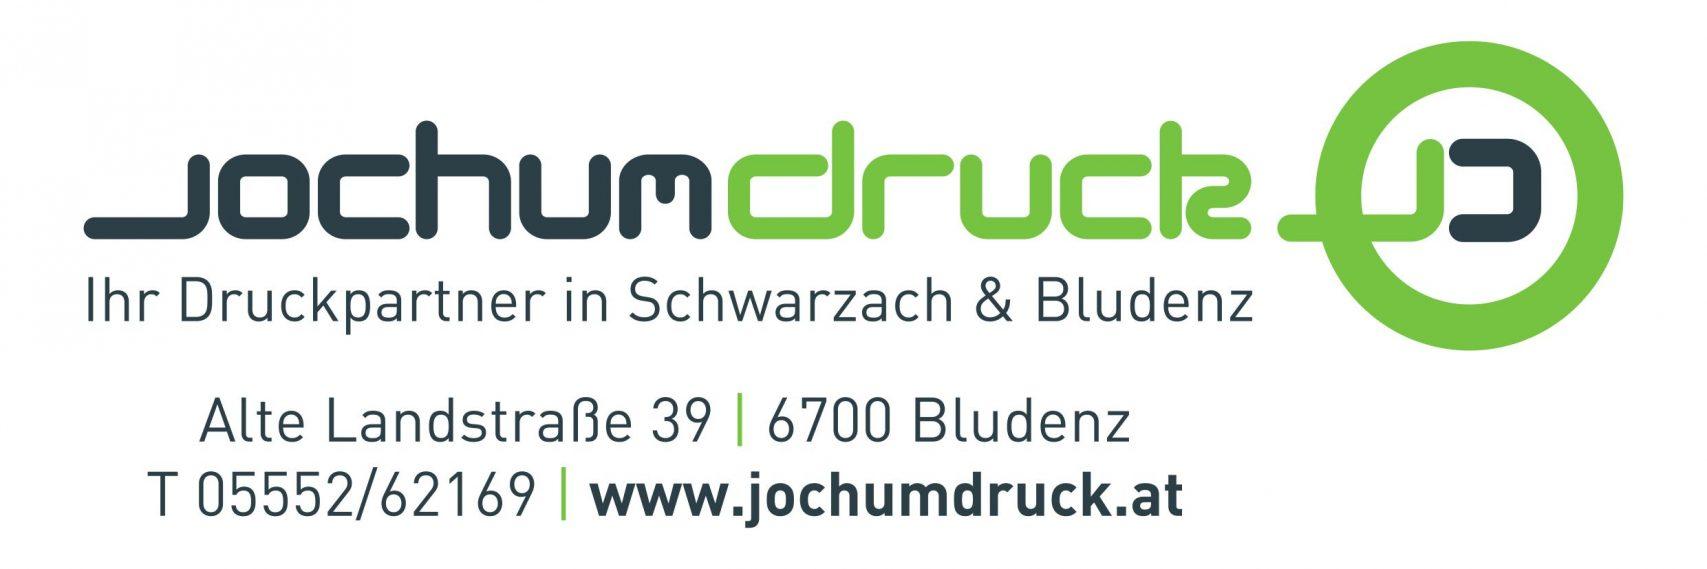 JochumDruck